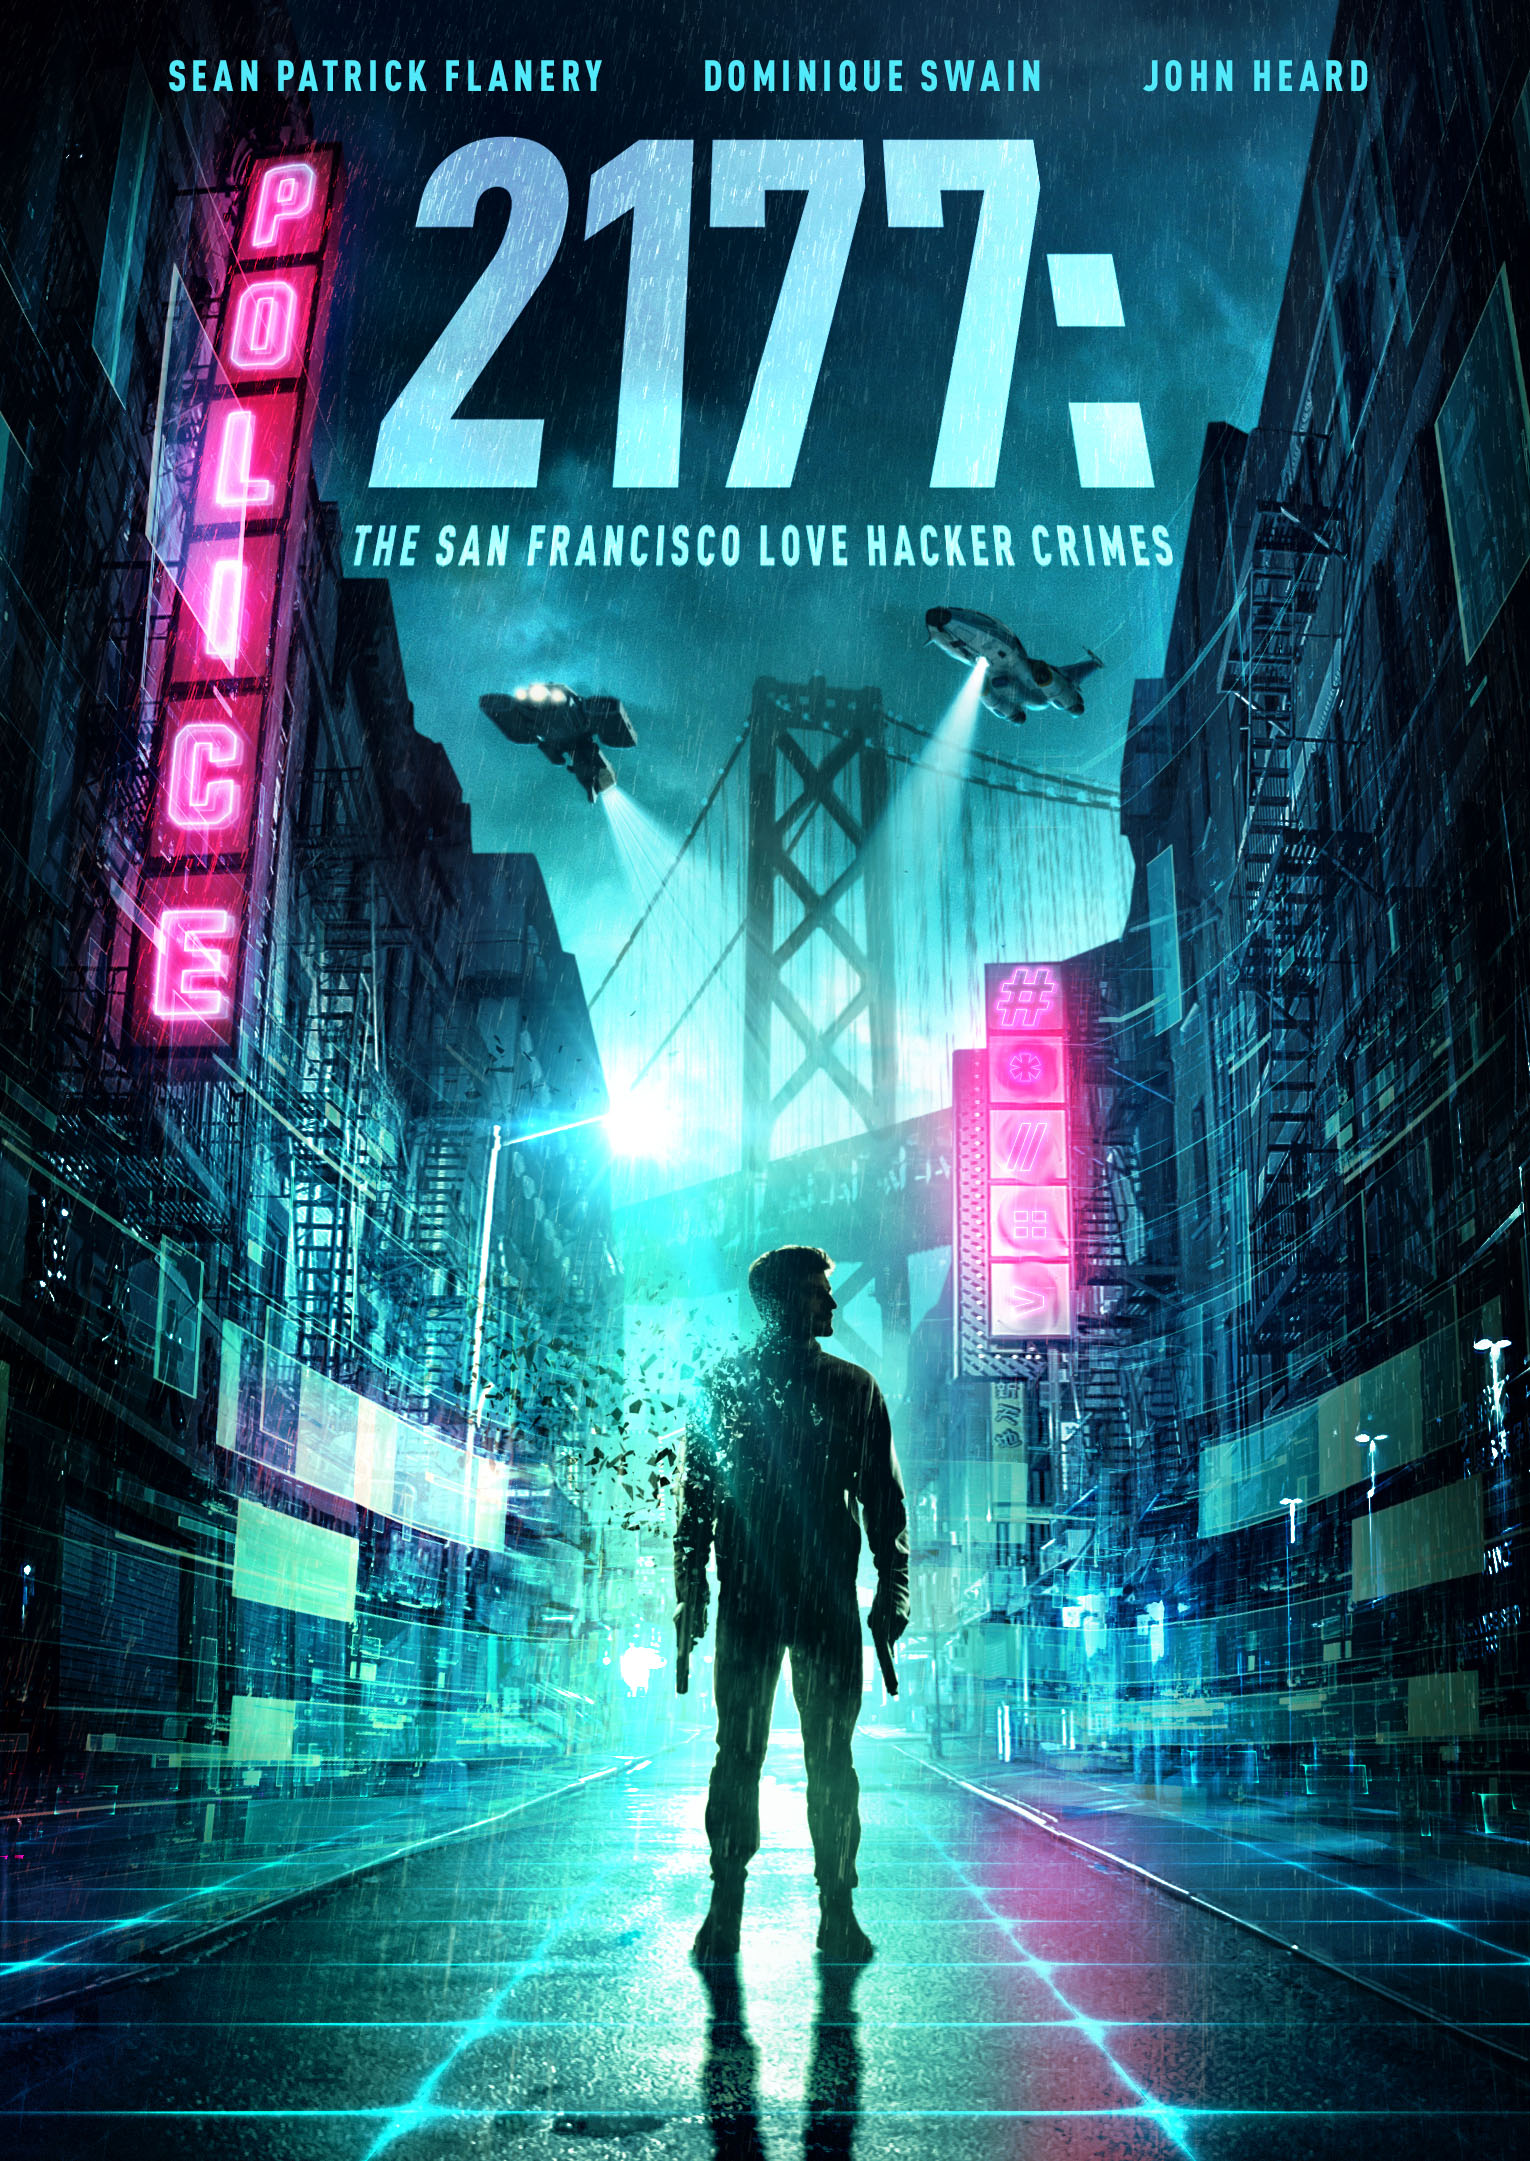 2177: The San Francisco Love Hacker Crimes (2019) - IMDb